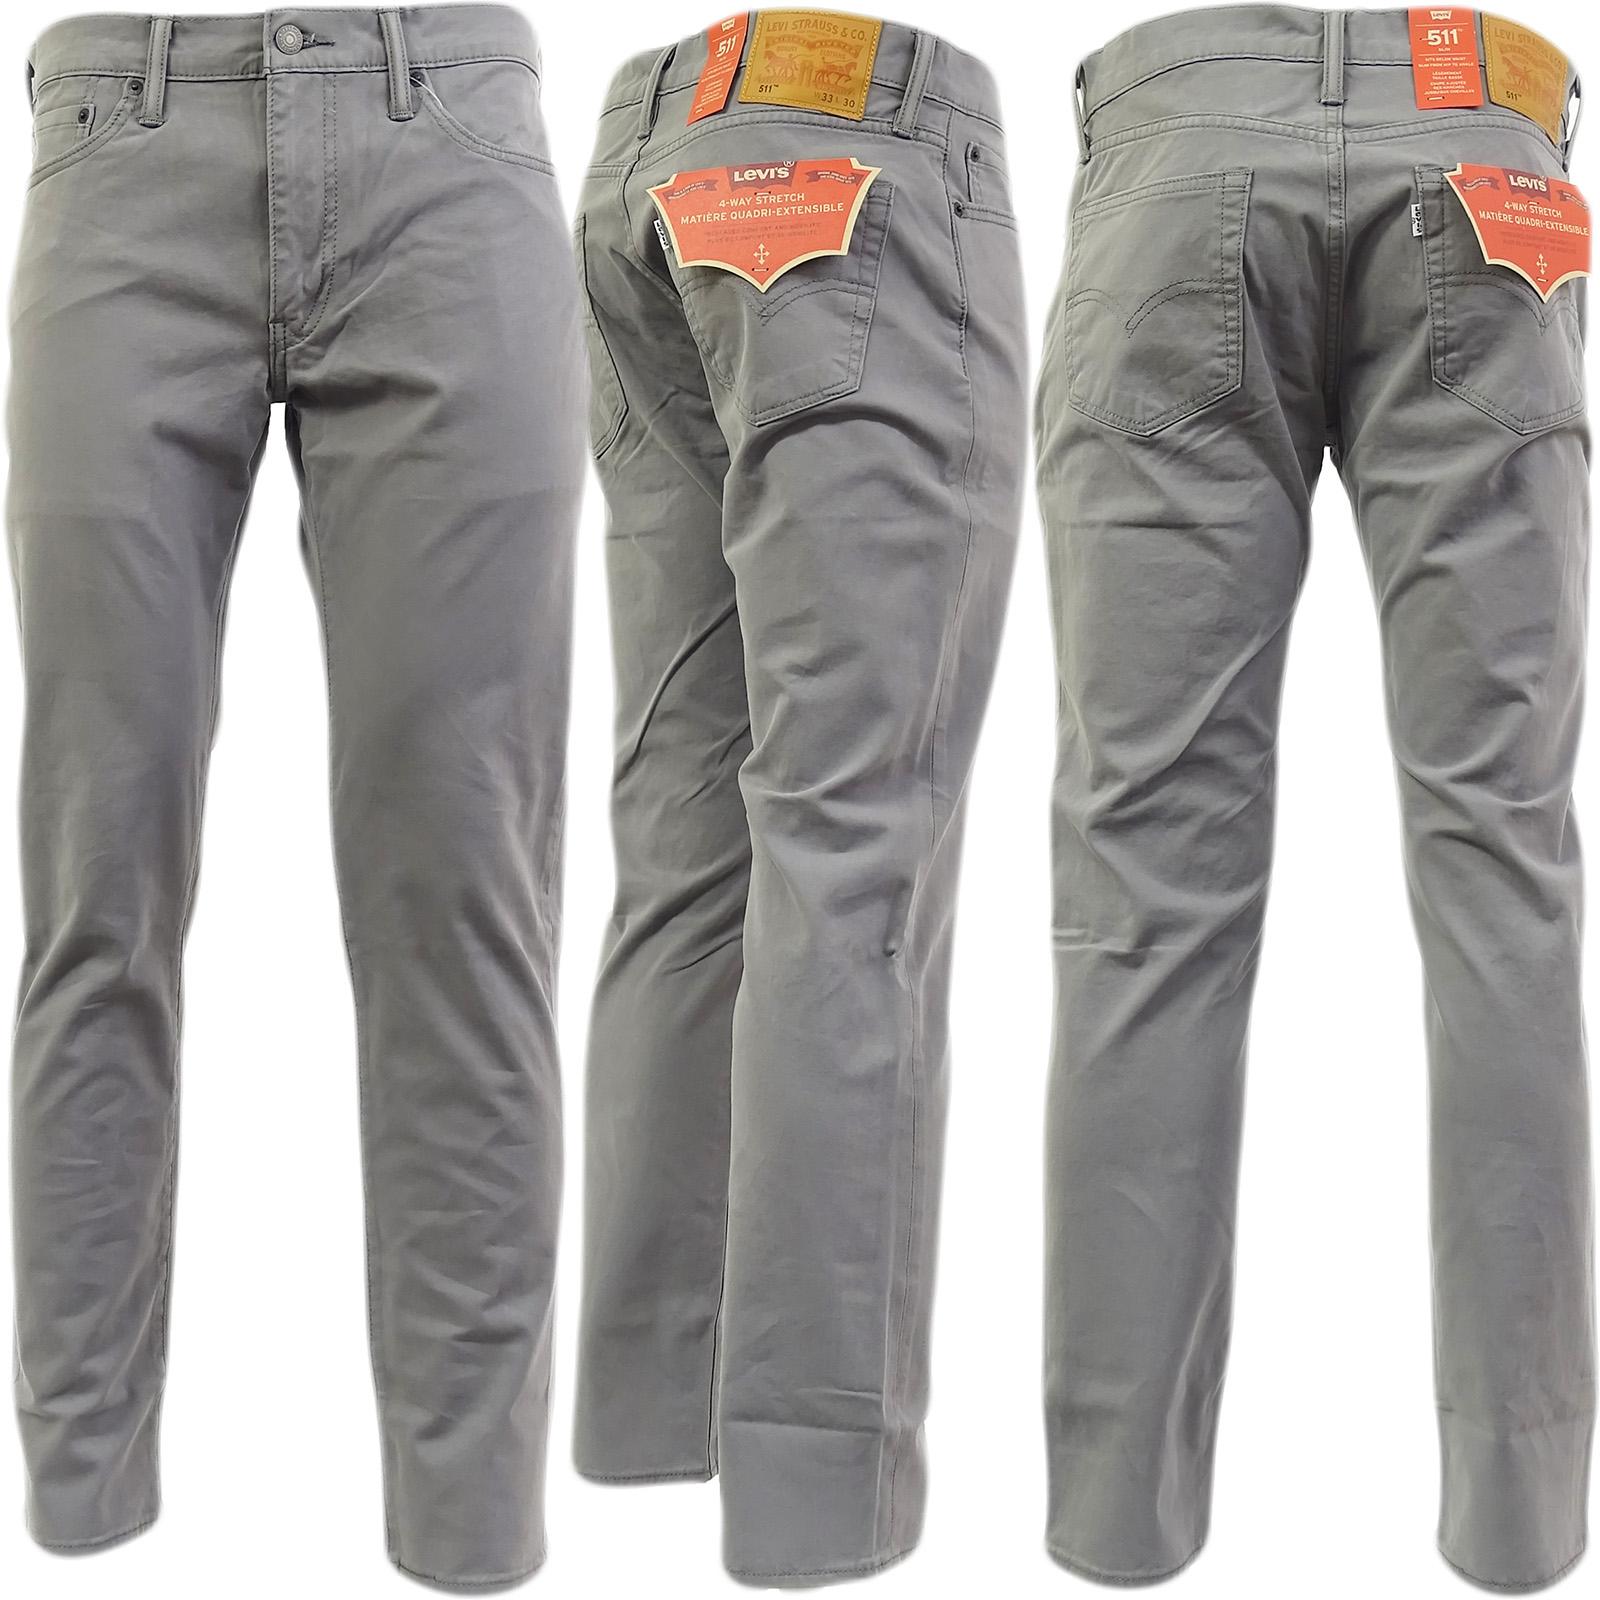 Levi Strauss 26 16 511 Slim Leg Jean 36 In 34l Ebay